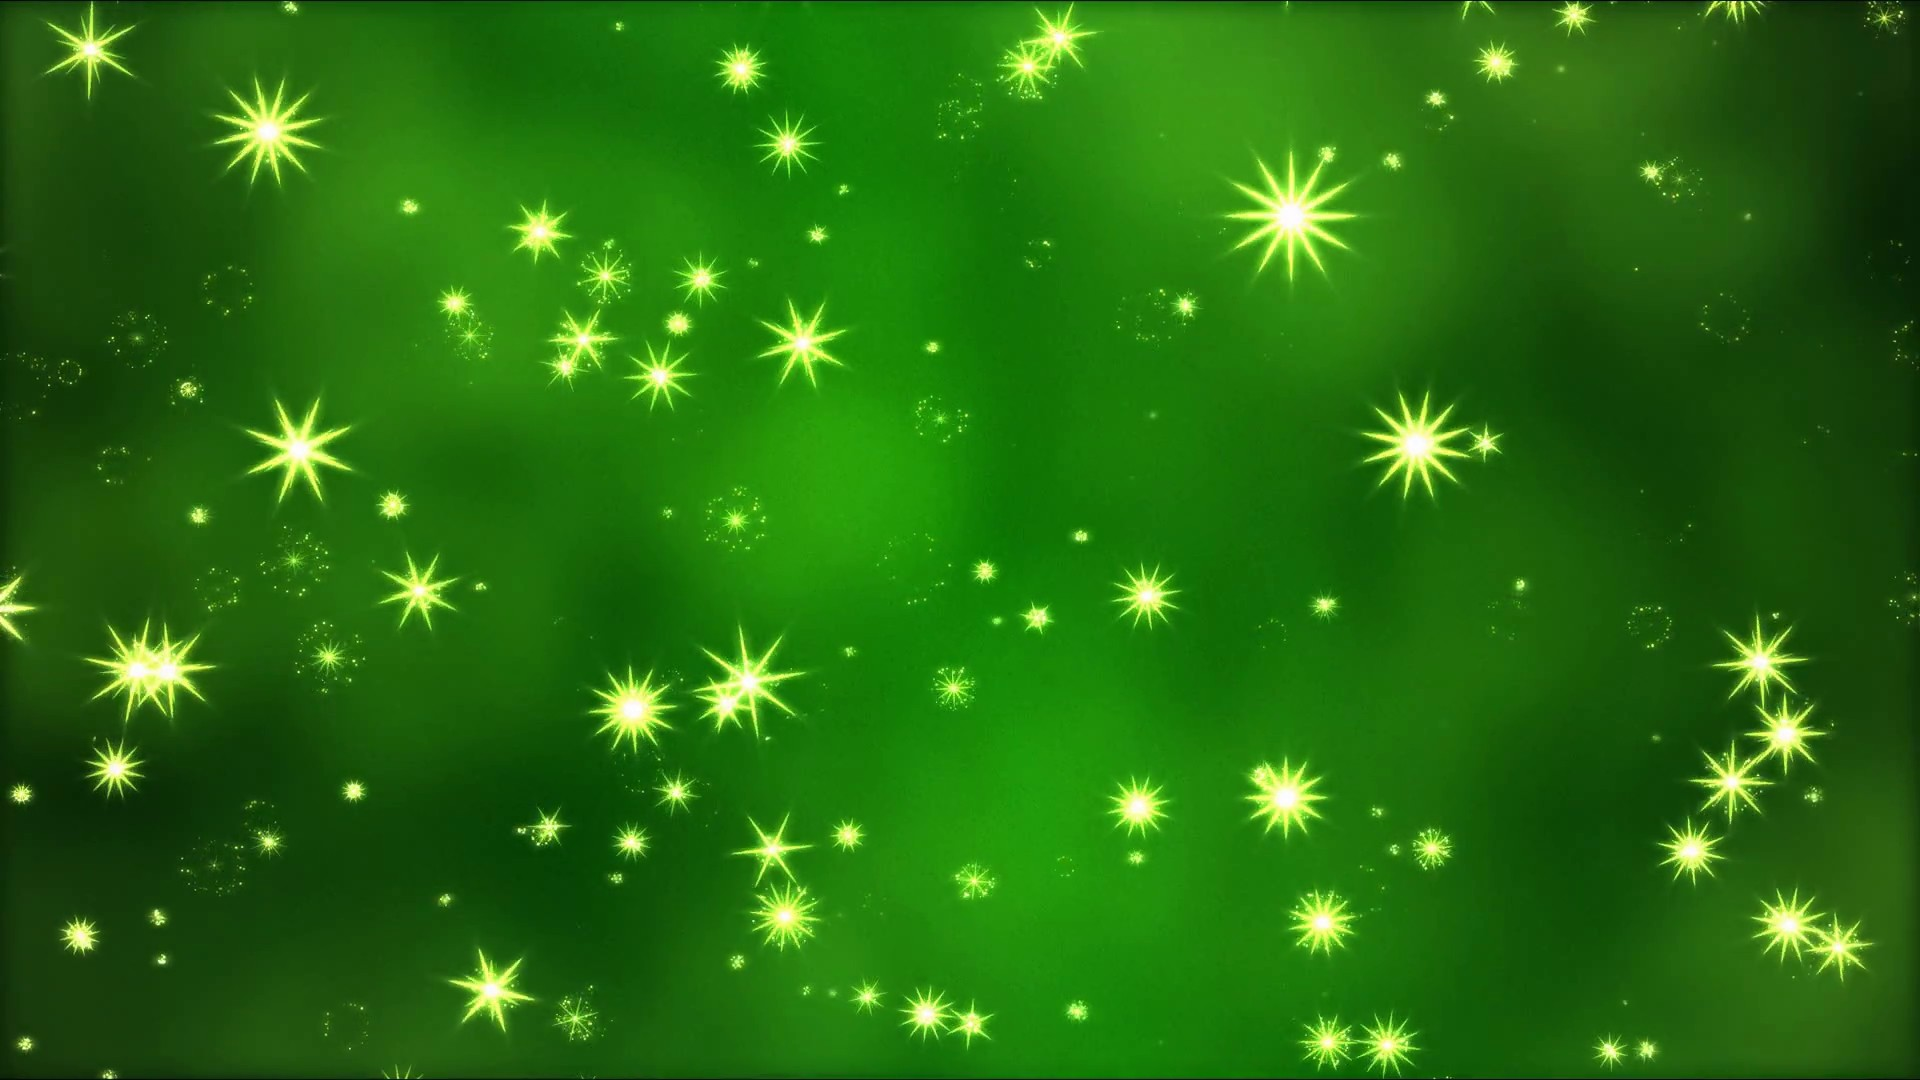 Spark Green Wallpaper